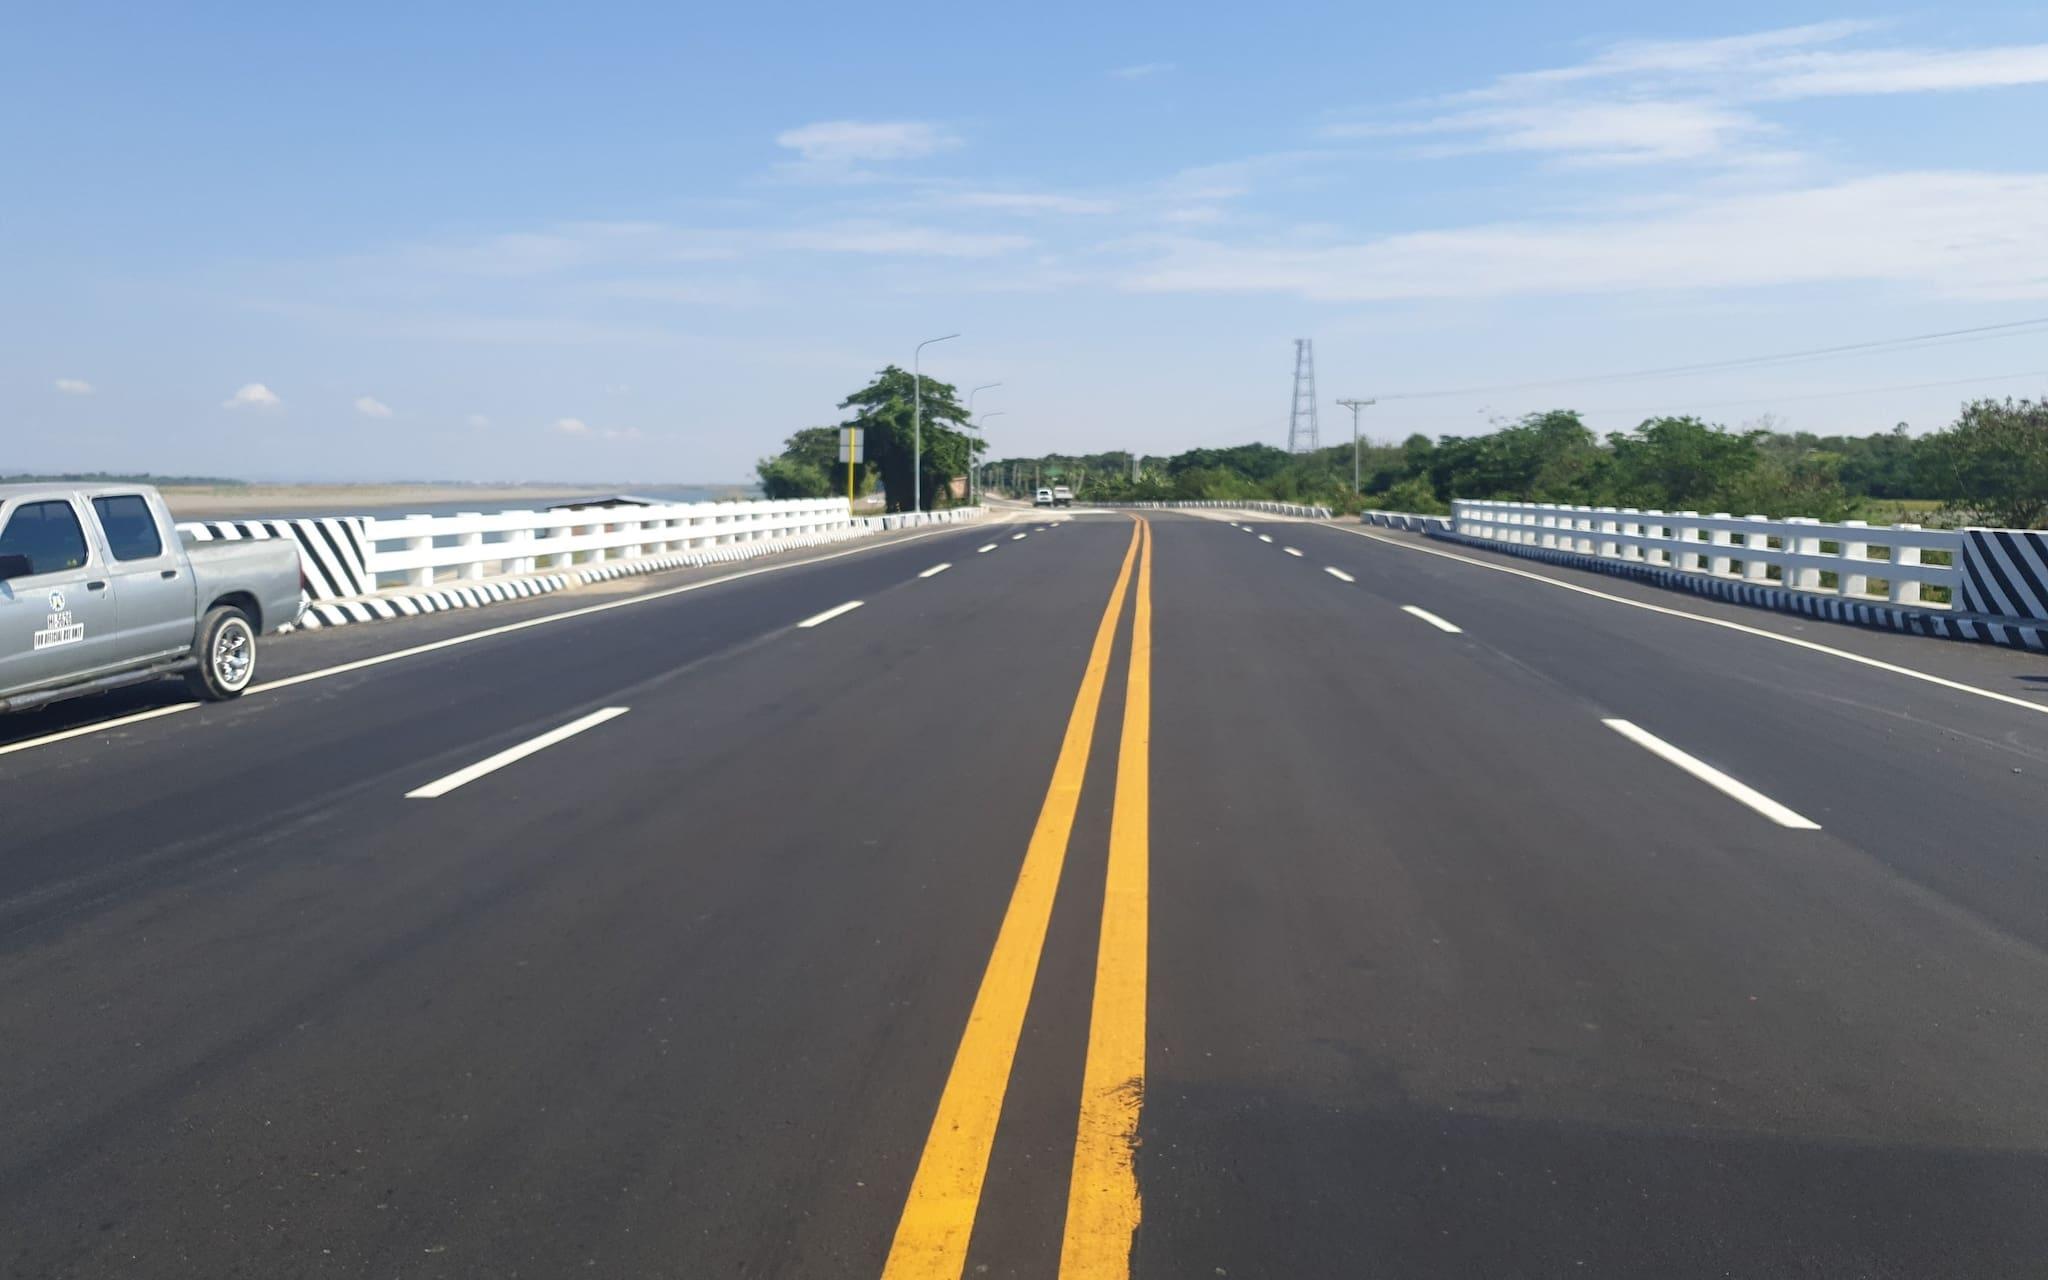 DPWH Completes Widening of Cabbo, Uru Bridges in Cagayan Valley Region